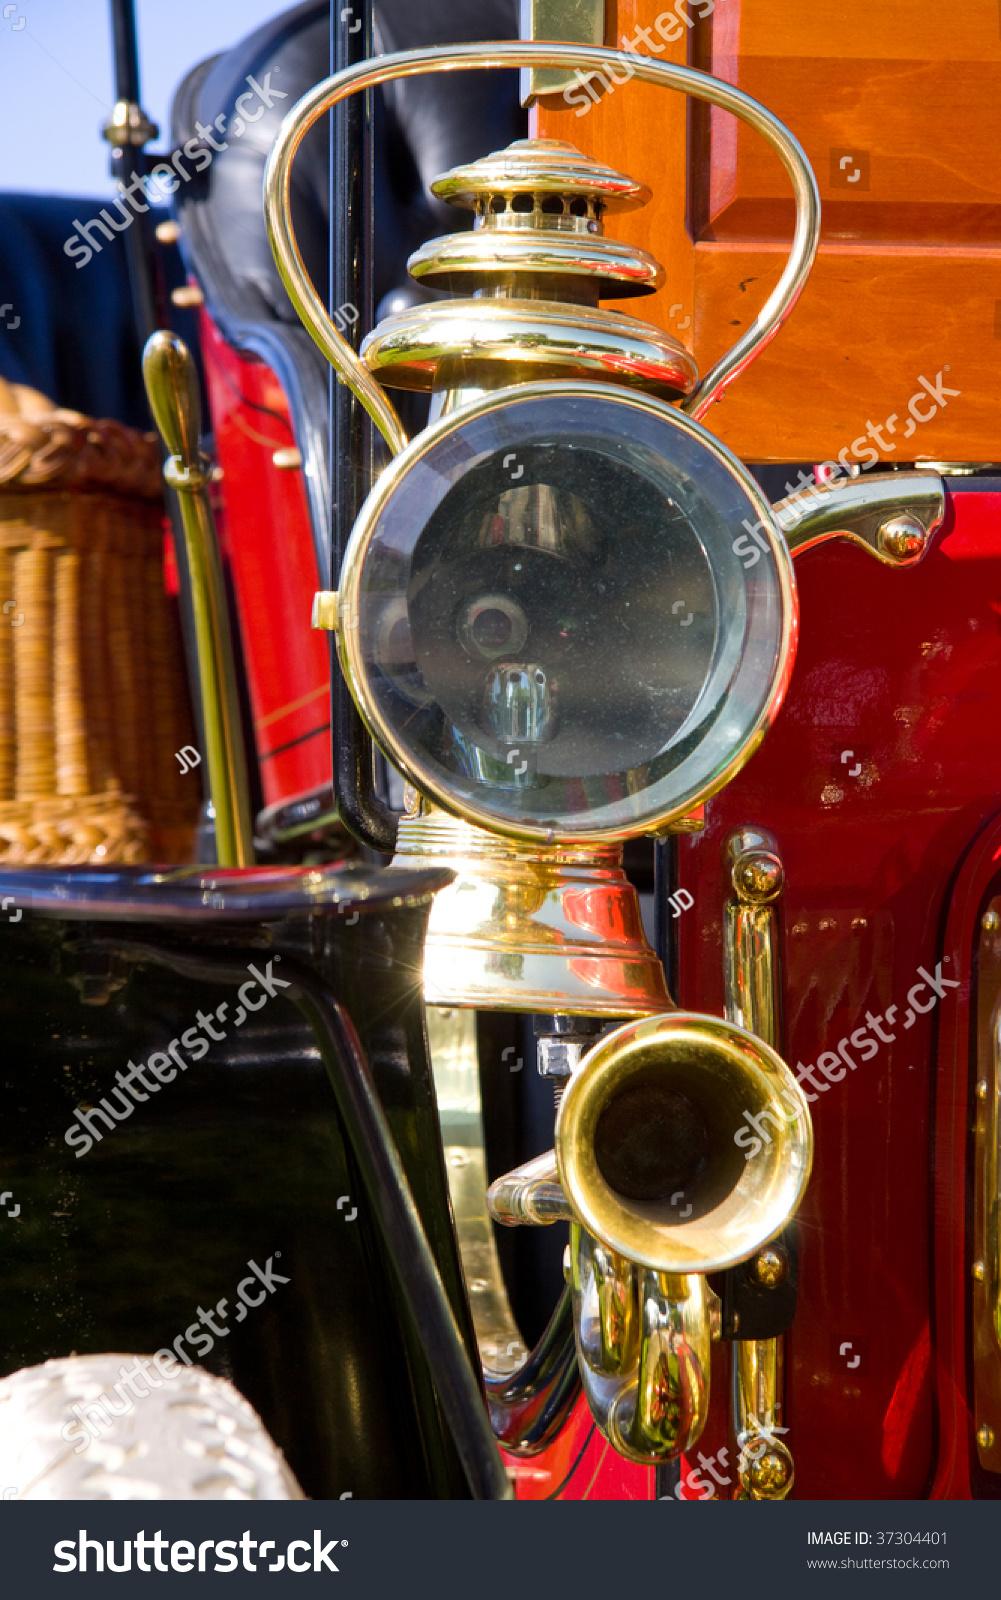 Antique Automobile Headlamps : Antique car headlight stock photo shutterstock